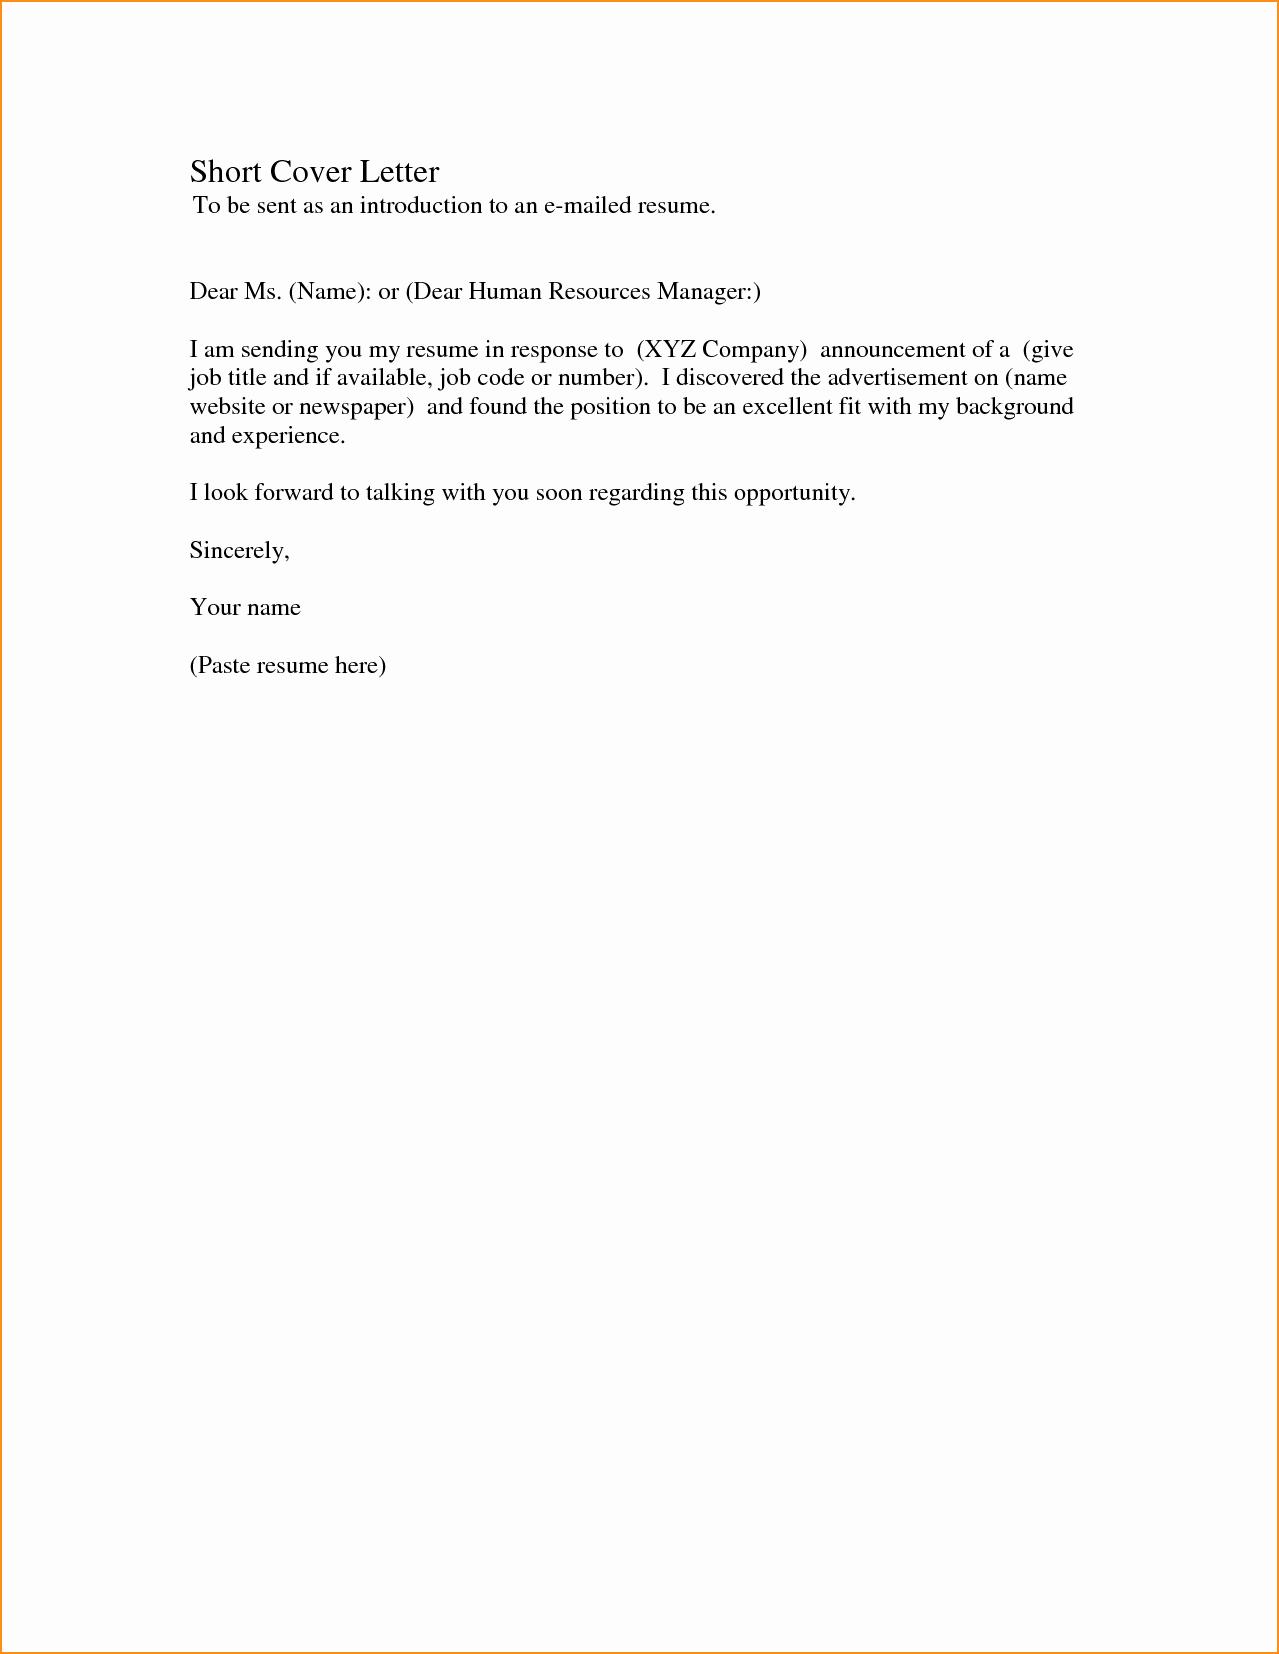 Cover Letter for Office Work Fresh Short Cover Letter for A Job Application